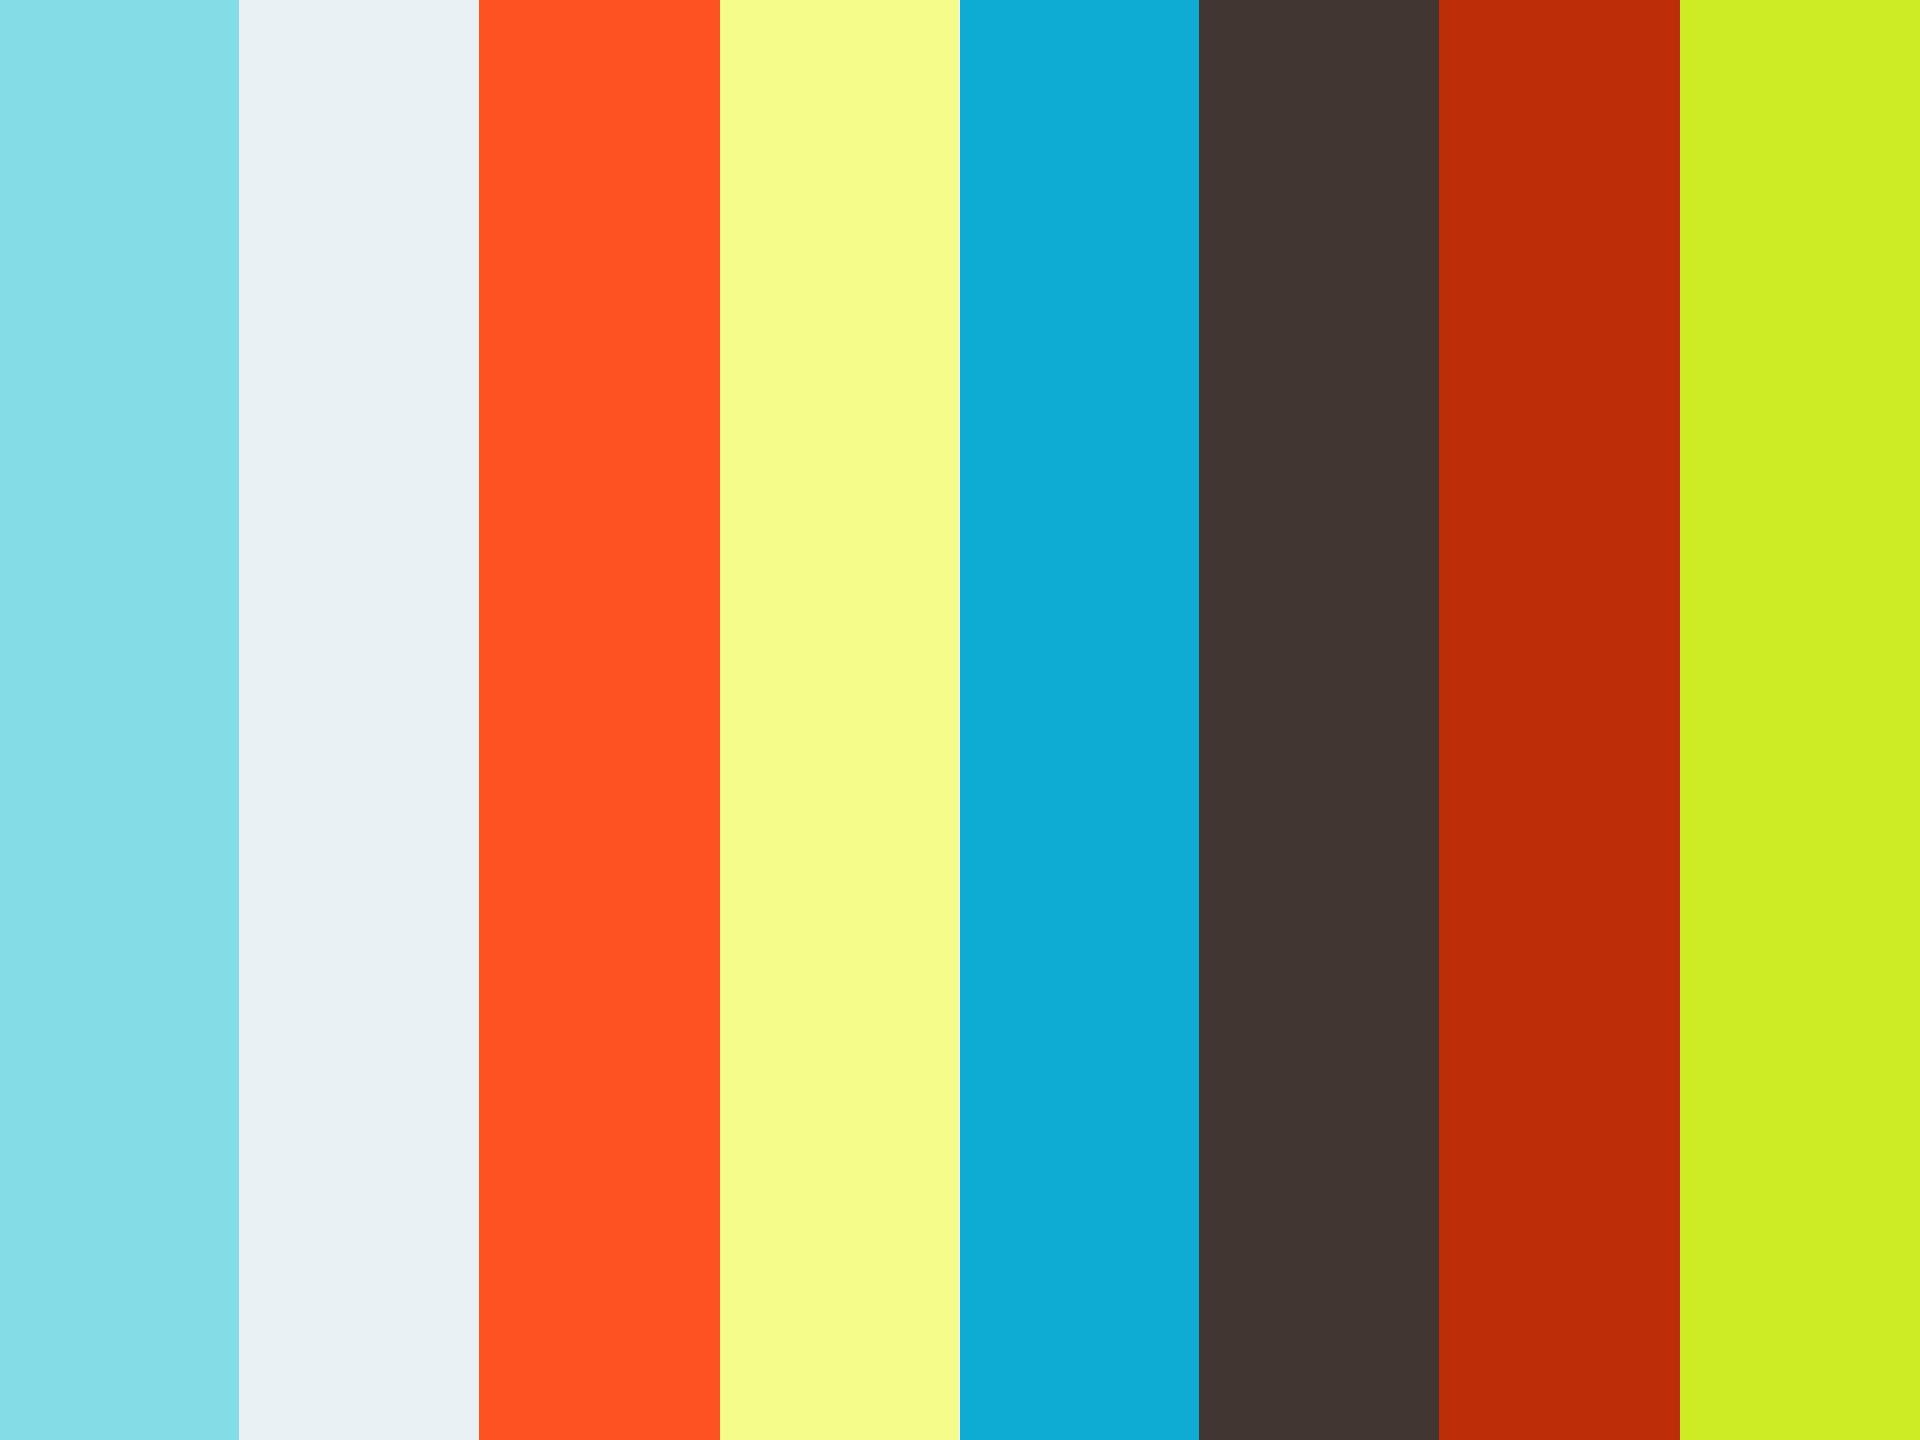 MERCEDES BENZ GLA 250 - BLACK - 2016